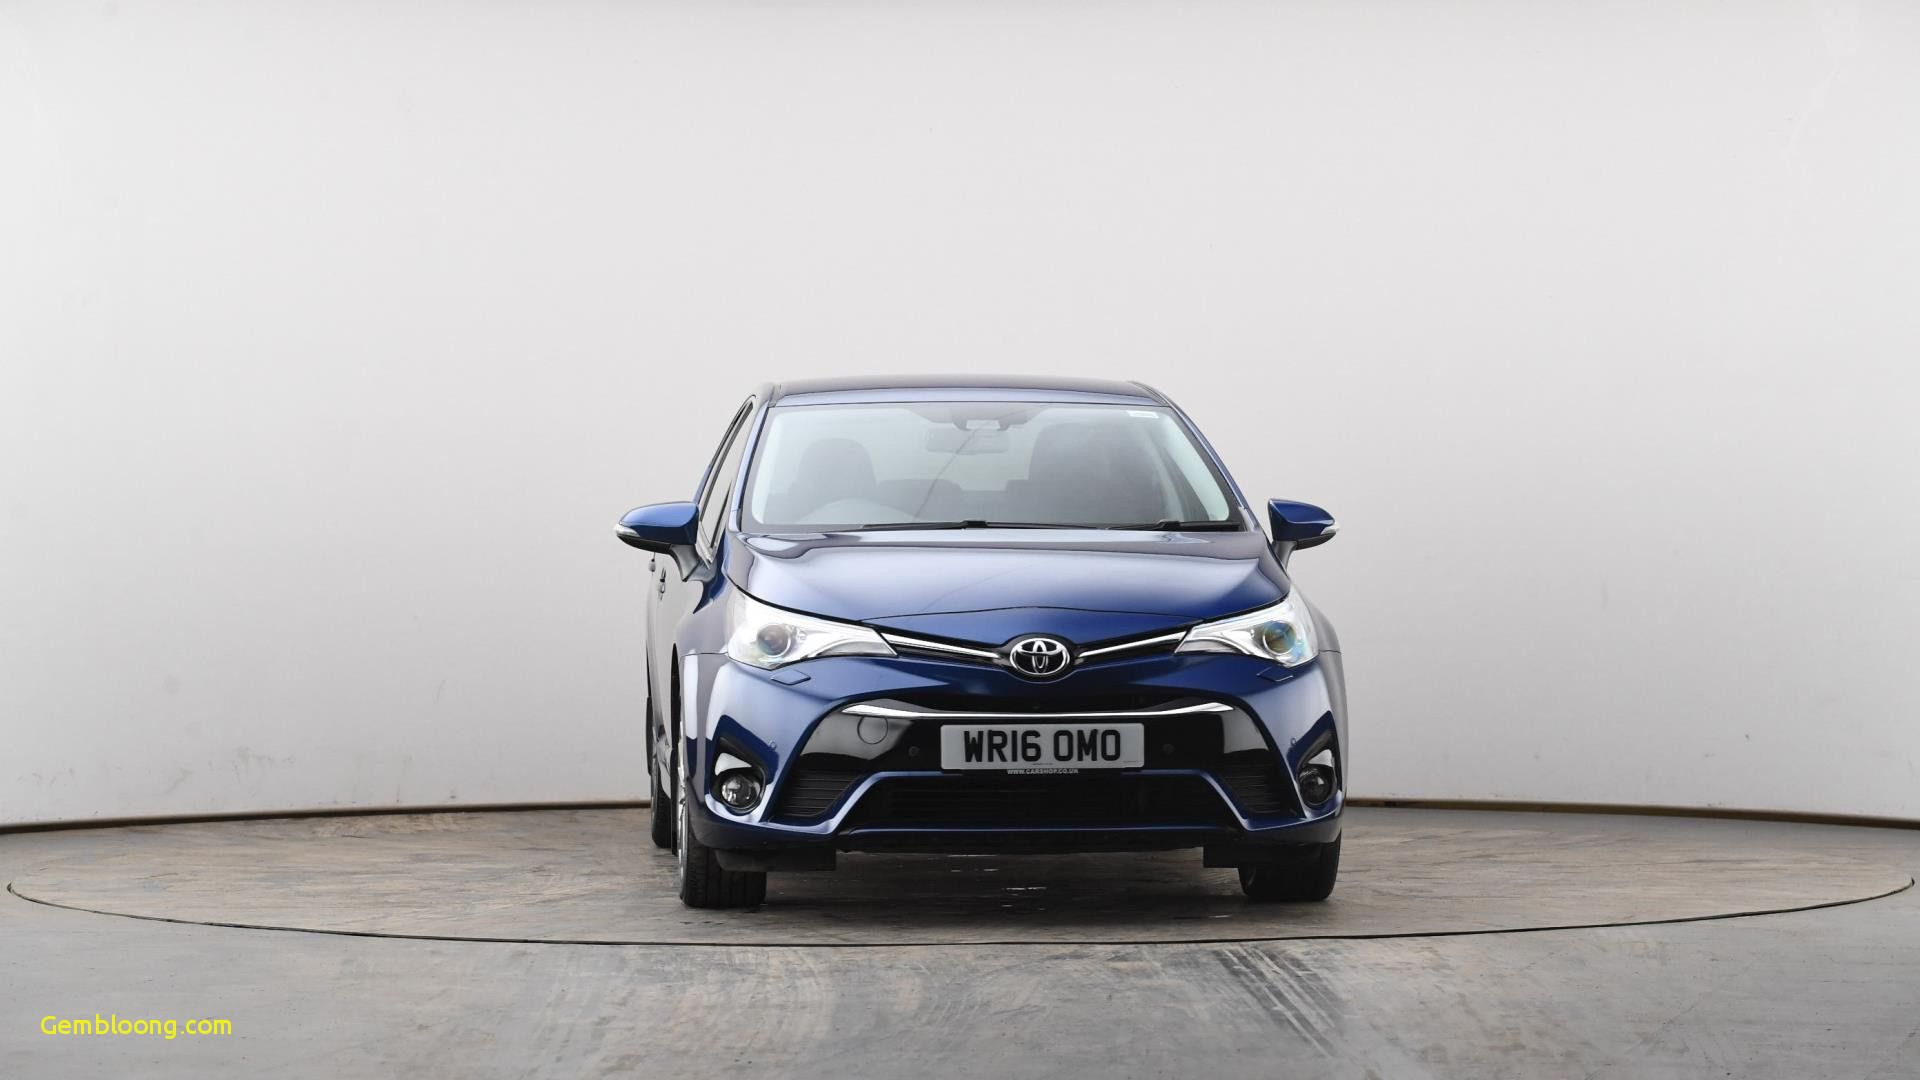 Toyota Avensis 2019 Spy Shots New 2019 toyota Yaris 2016